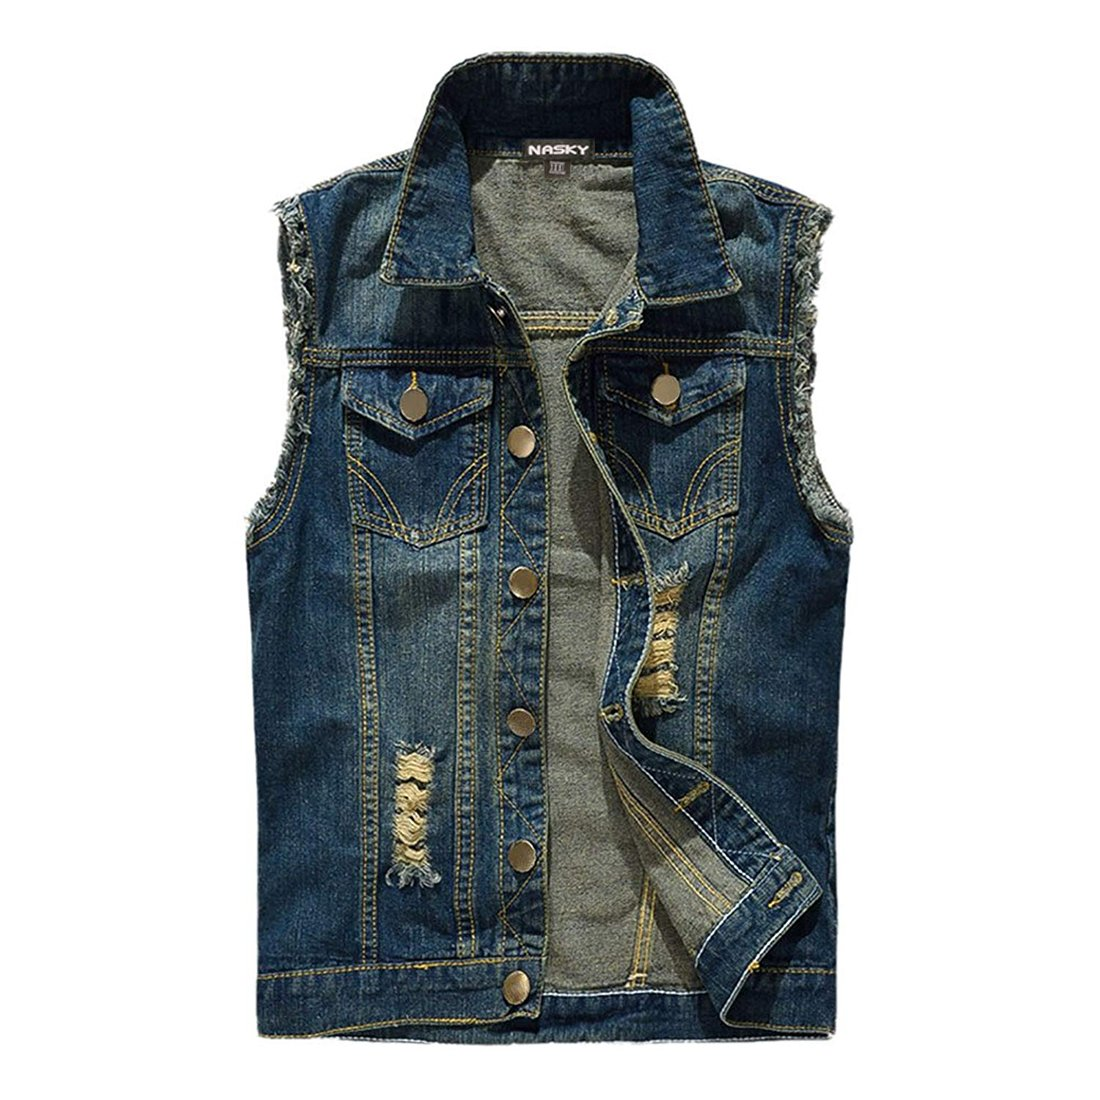 NASKY Men&Women's Fit Retro Ripped Denim Vest Sleeveless Lapel Jean Vest Jacket Waistcoat Top Plus Size X-Large